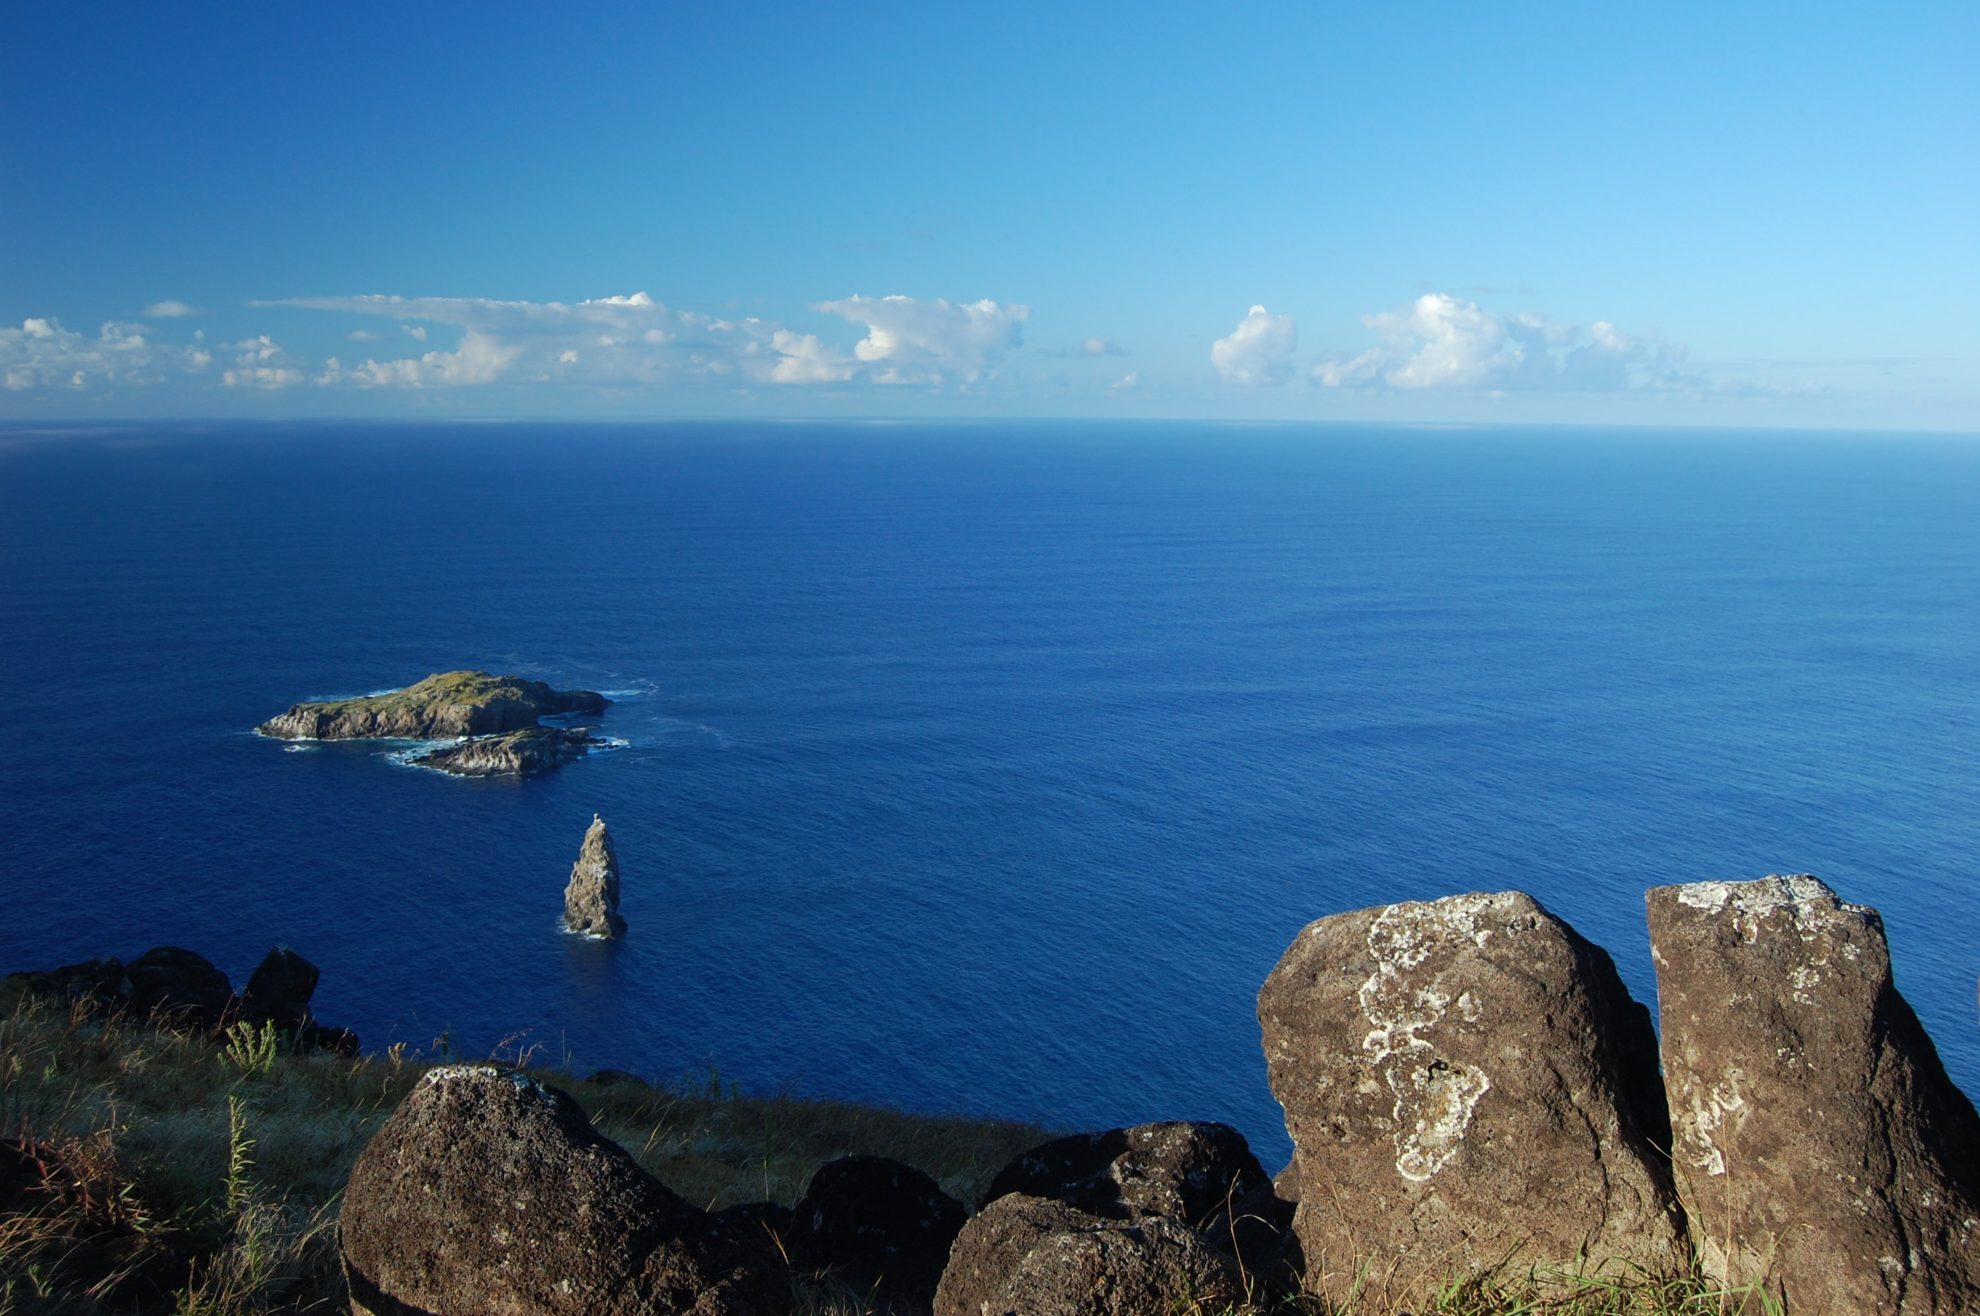 Берег Тихого океана с острова пасхи